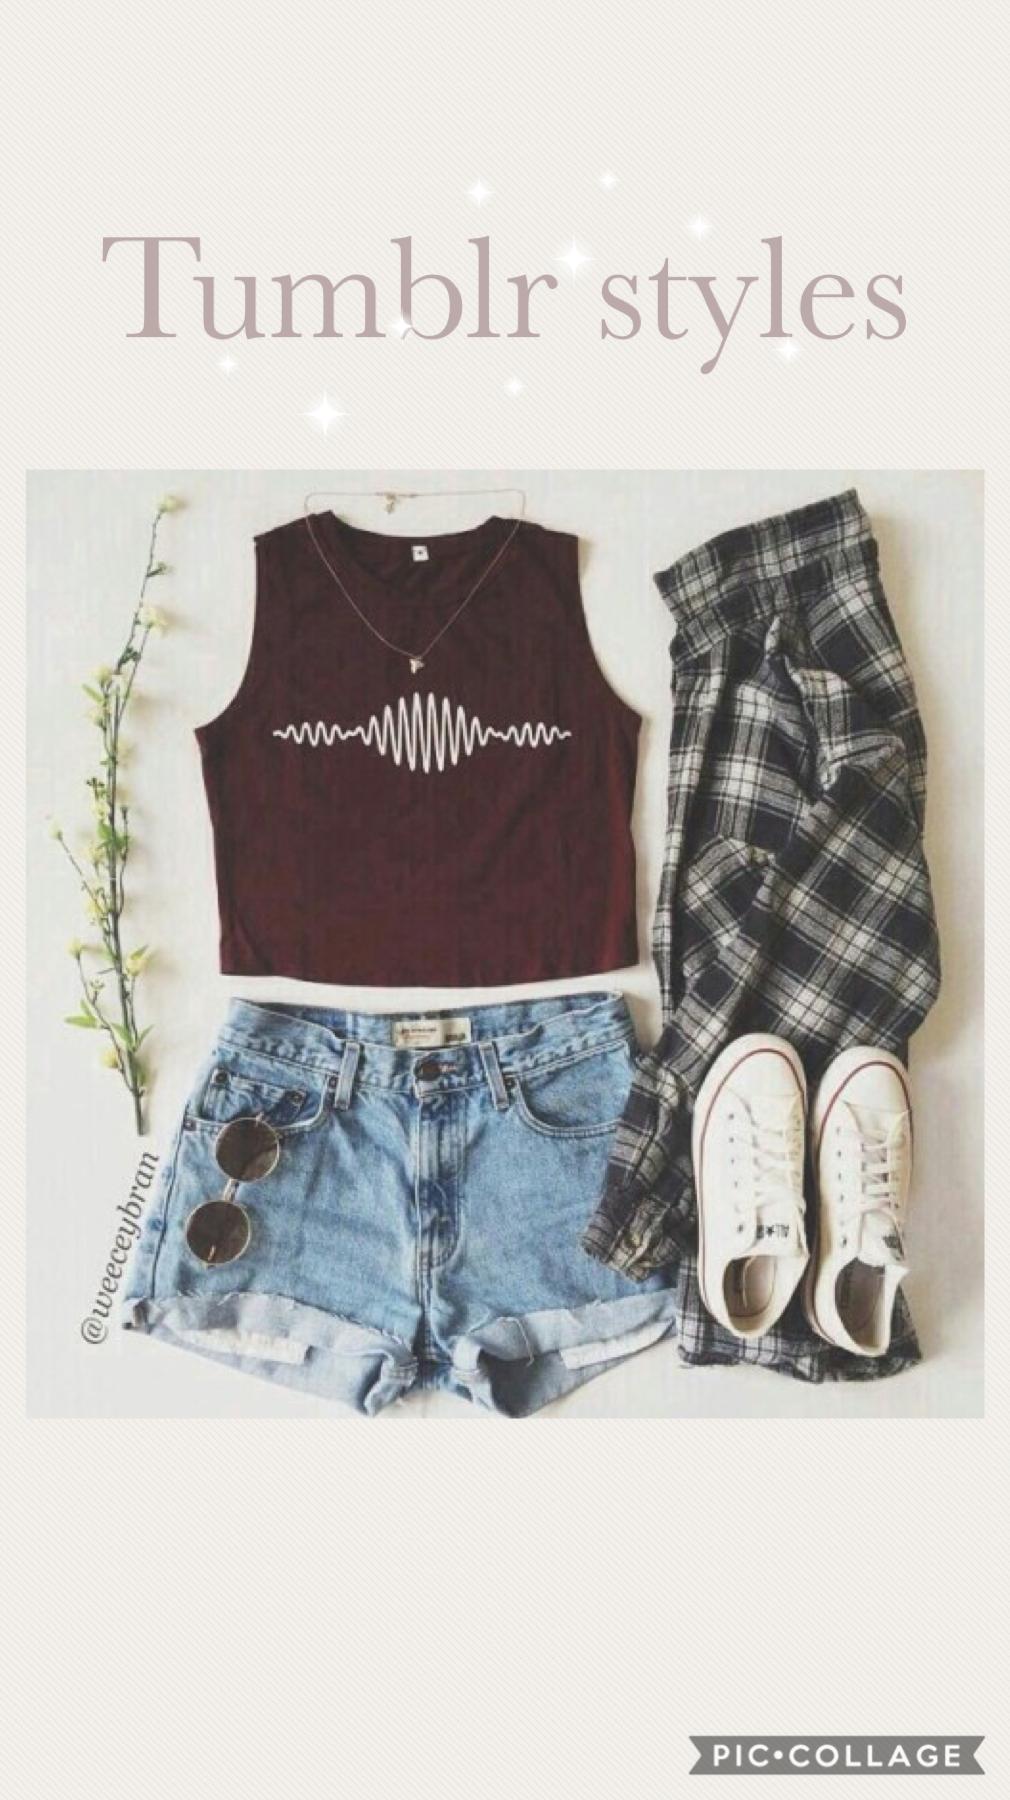 Tumblr styles #1